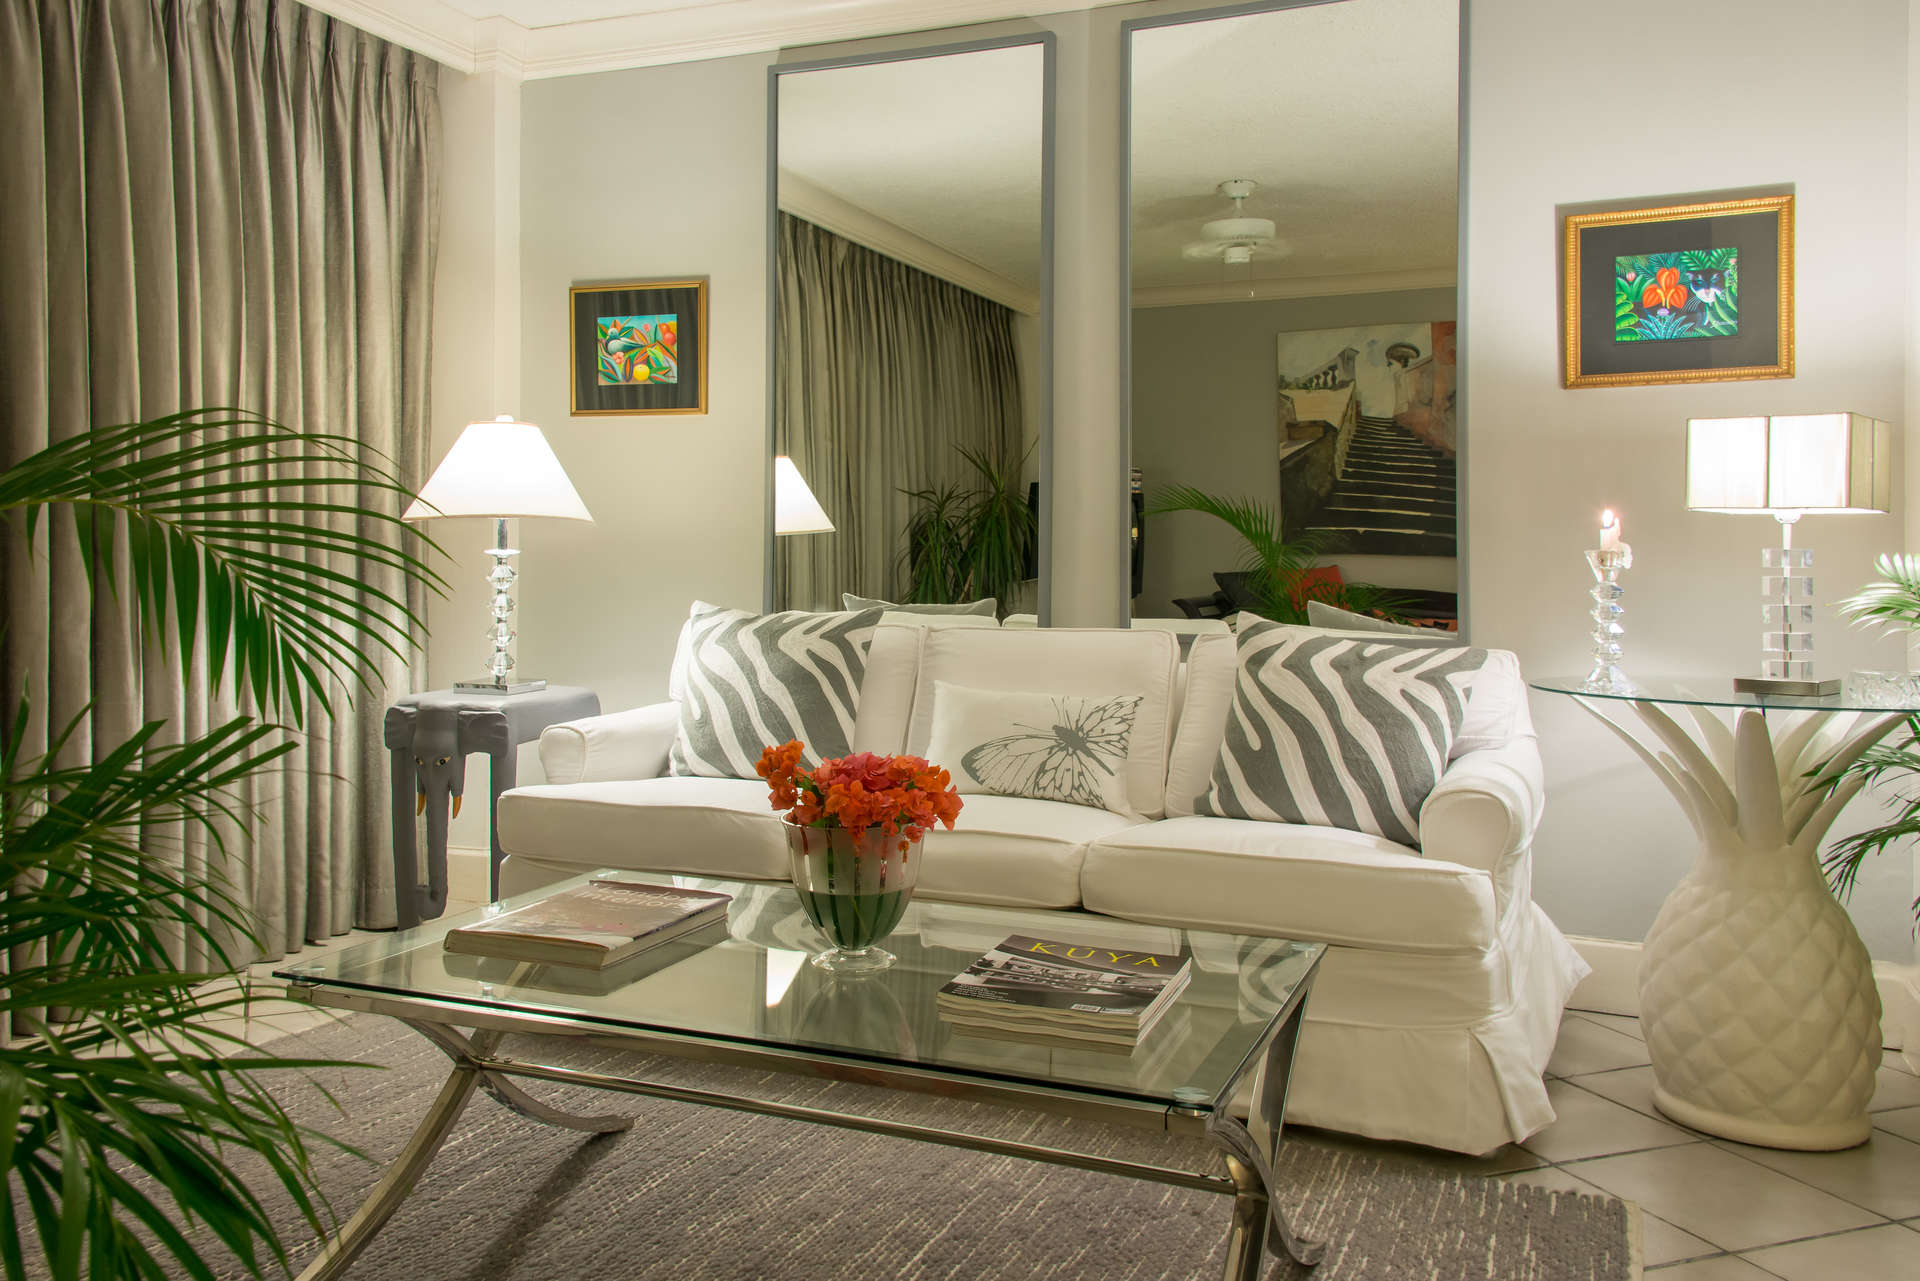 Luxury villa rentals caribbean - Jamaica - Try all club - No location 4 - Apartment Mirador - Image 1/16